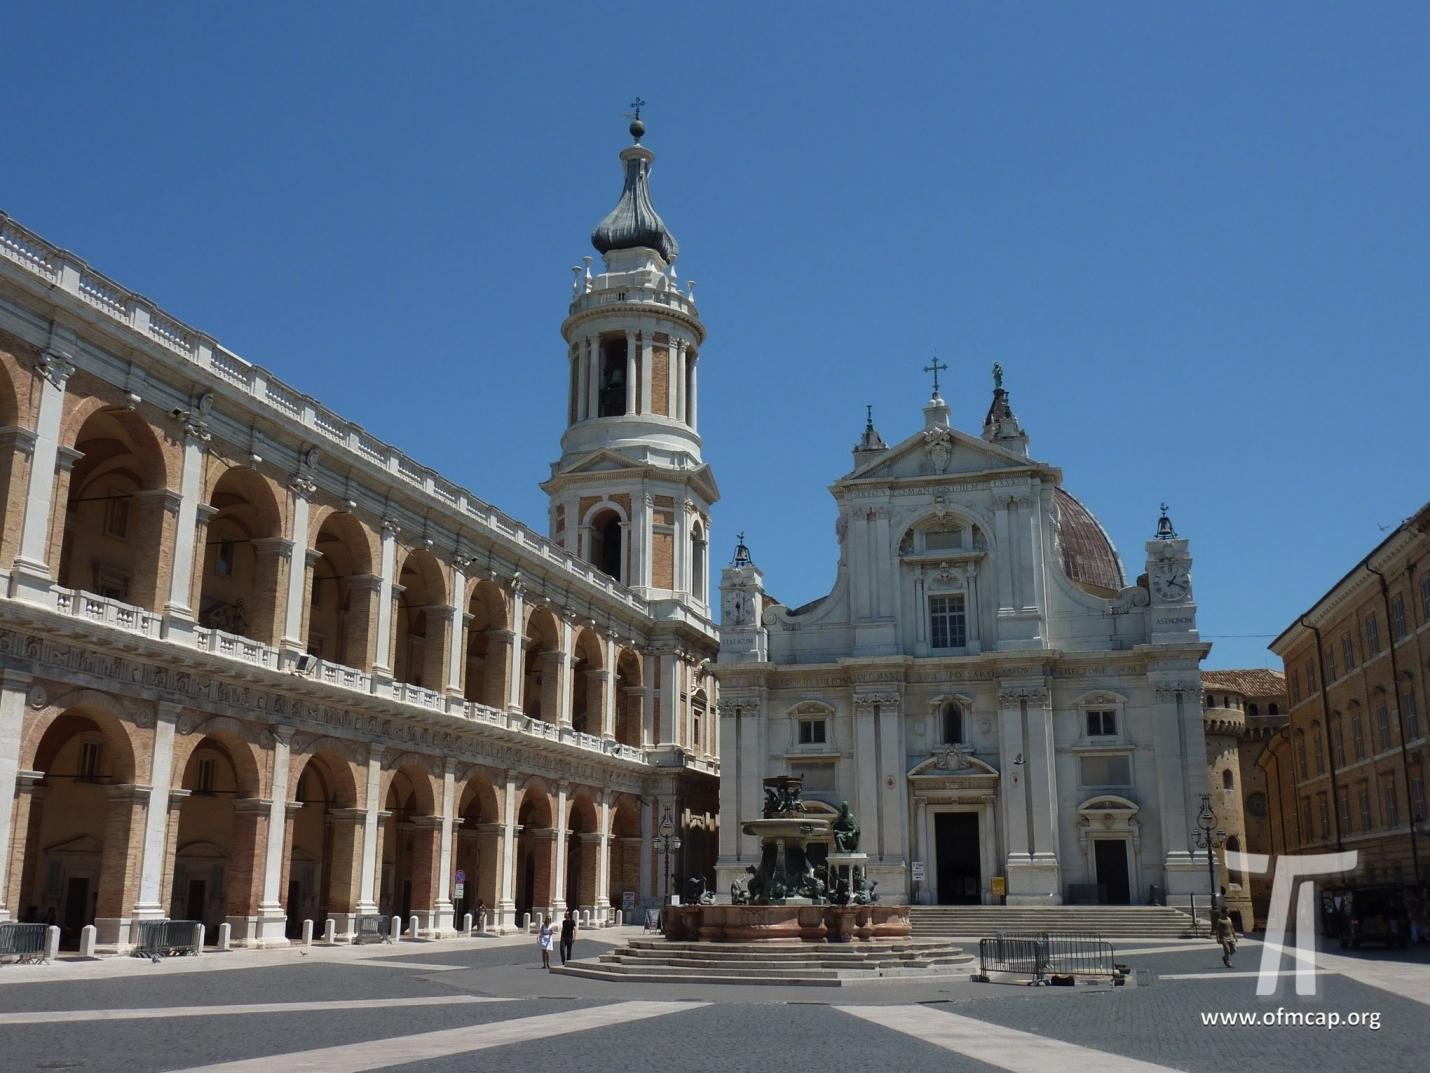 The Shrine of the Holy House of Loreto